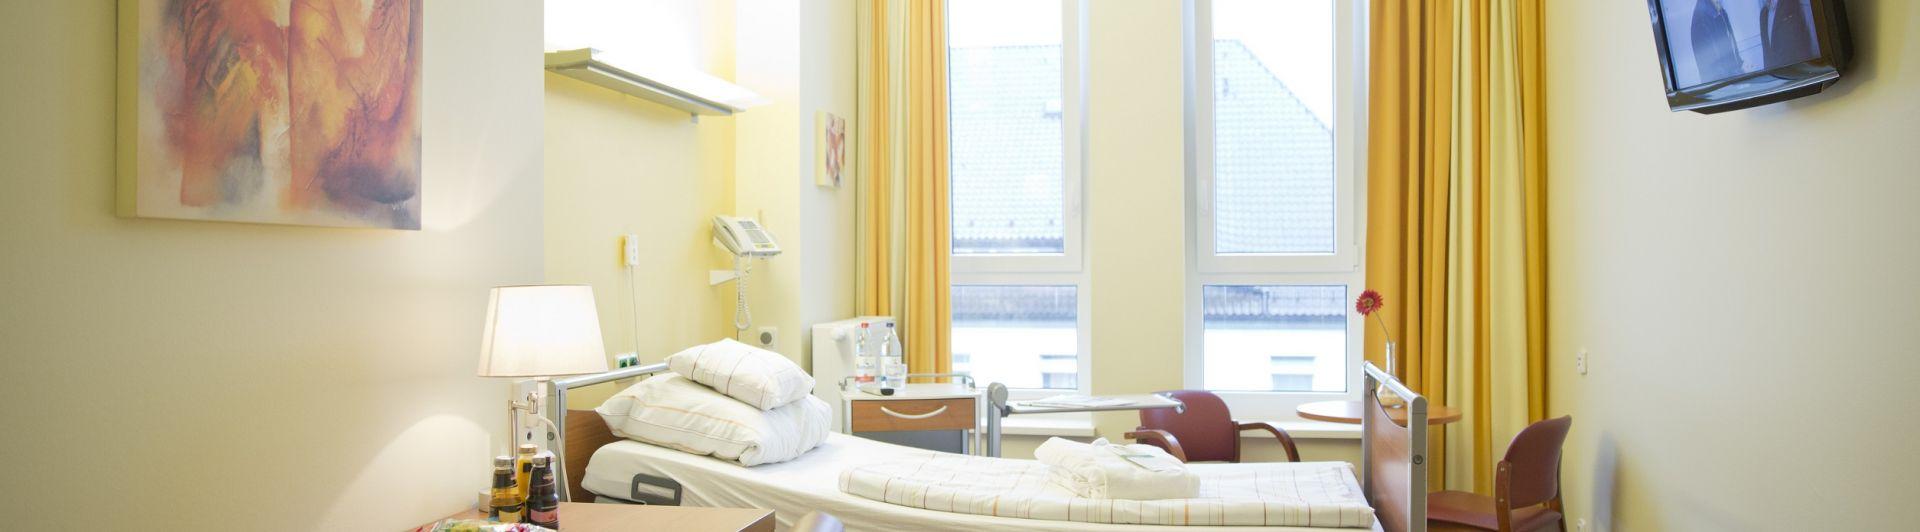 Asklepios Klinik Nord - Standort Heidberg